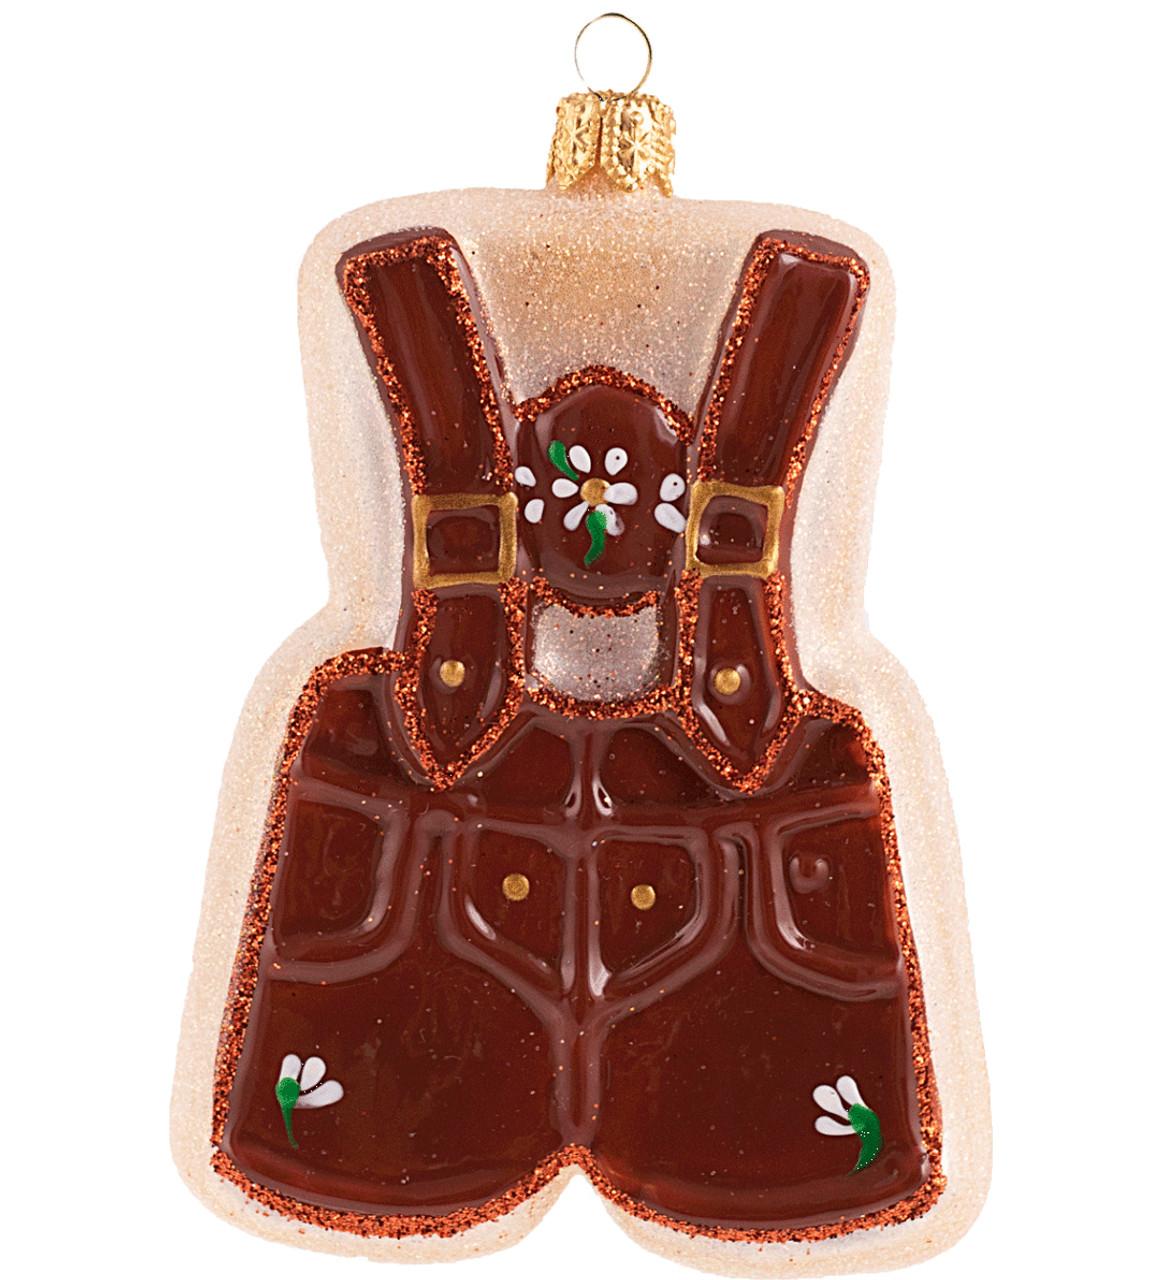 Lederhose Sugar Cookie Glass Christmas Ornament